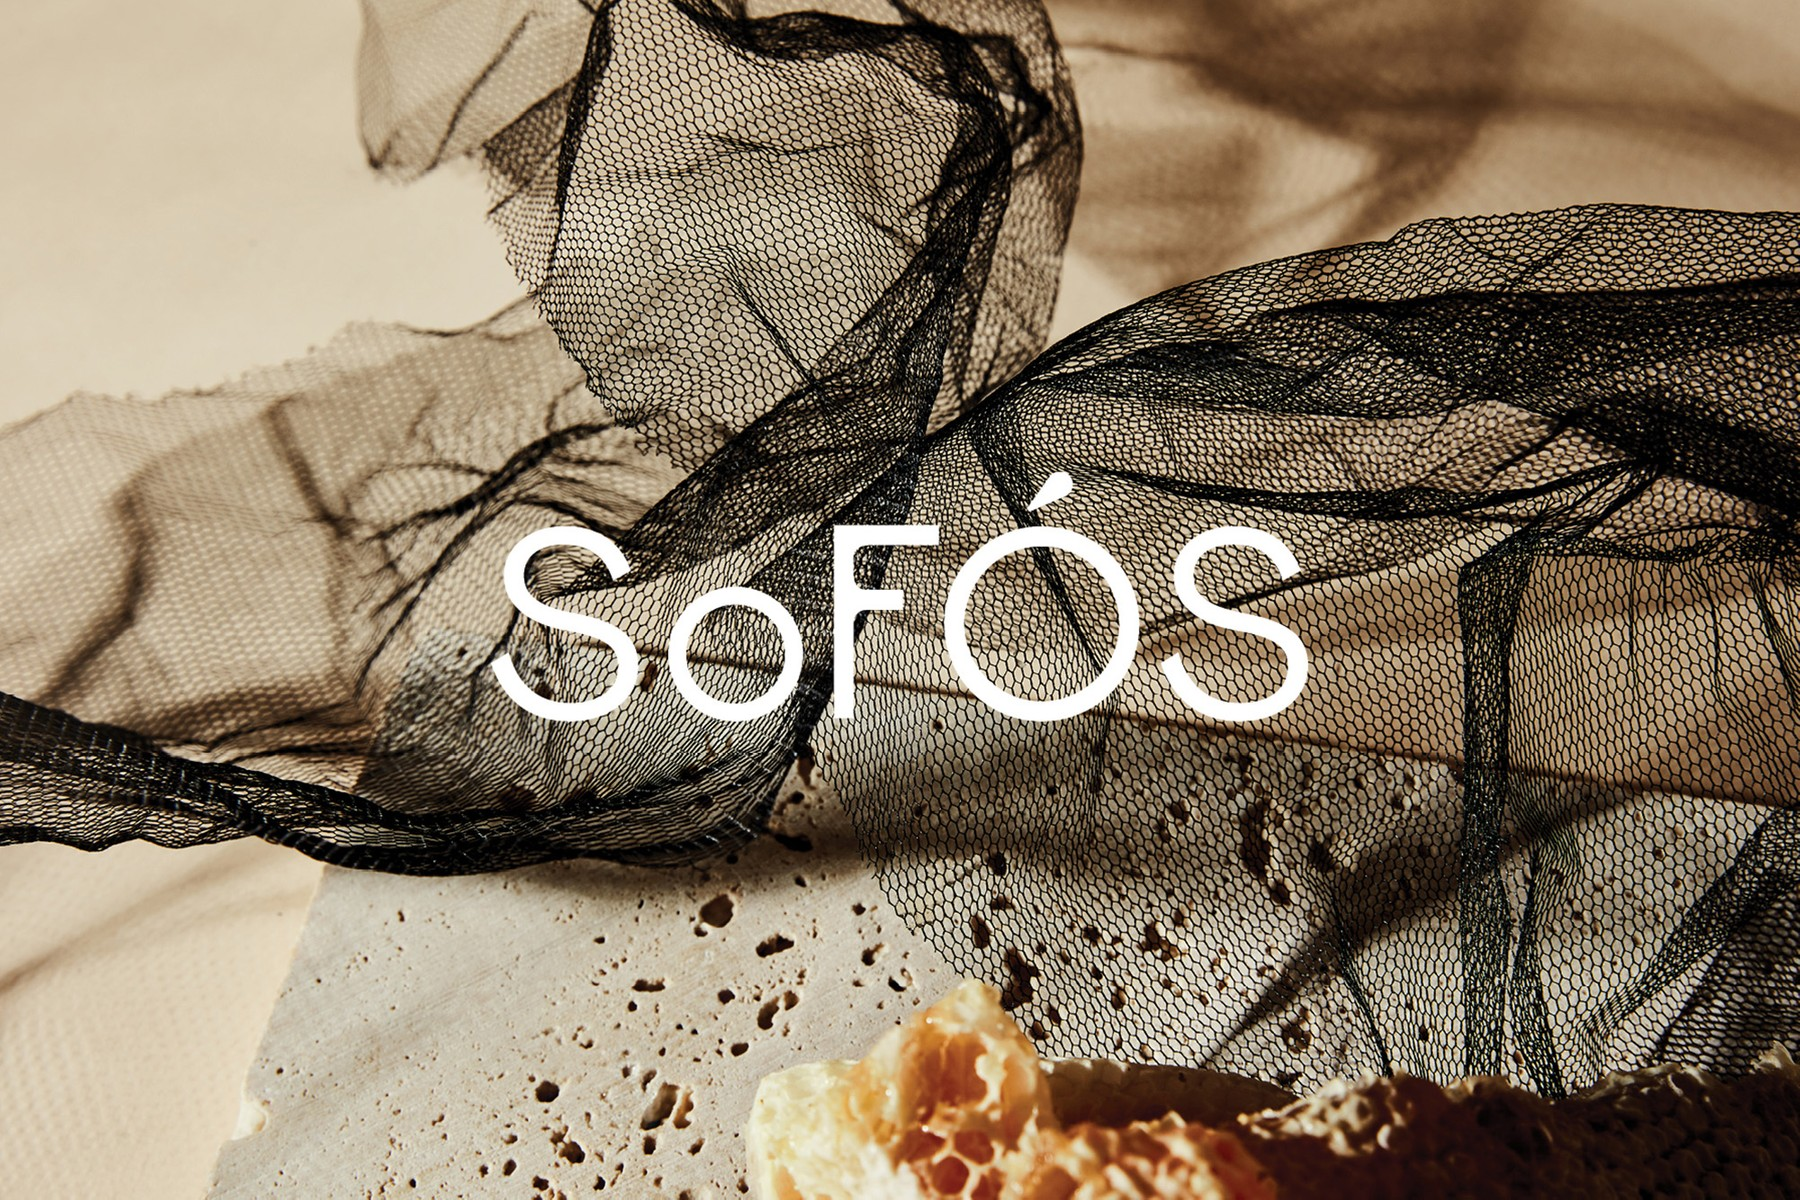 sofos_1.jpg